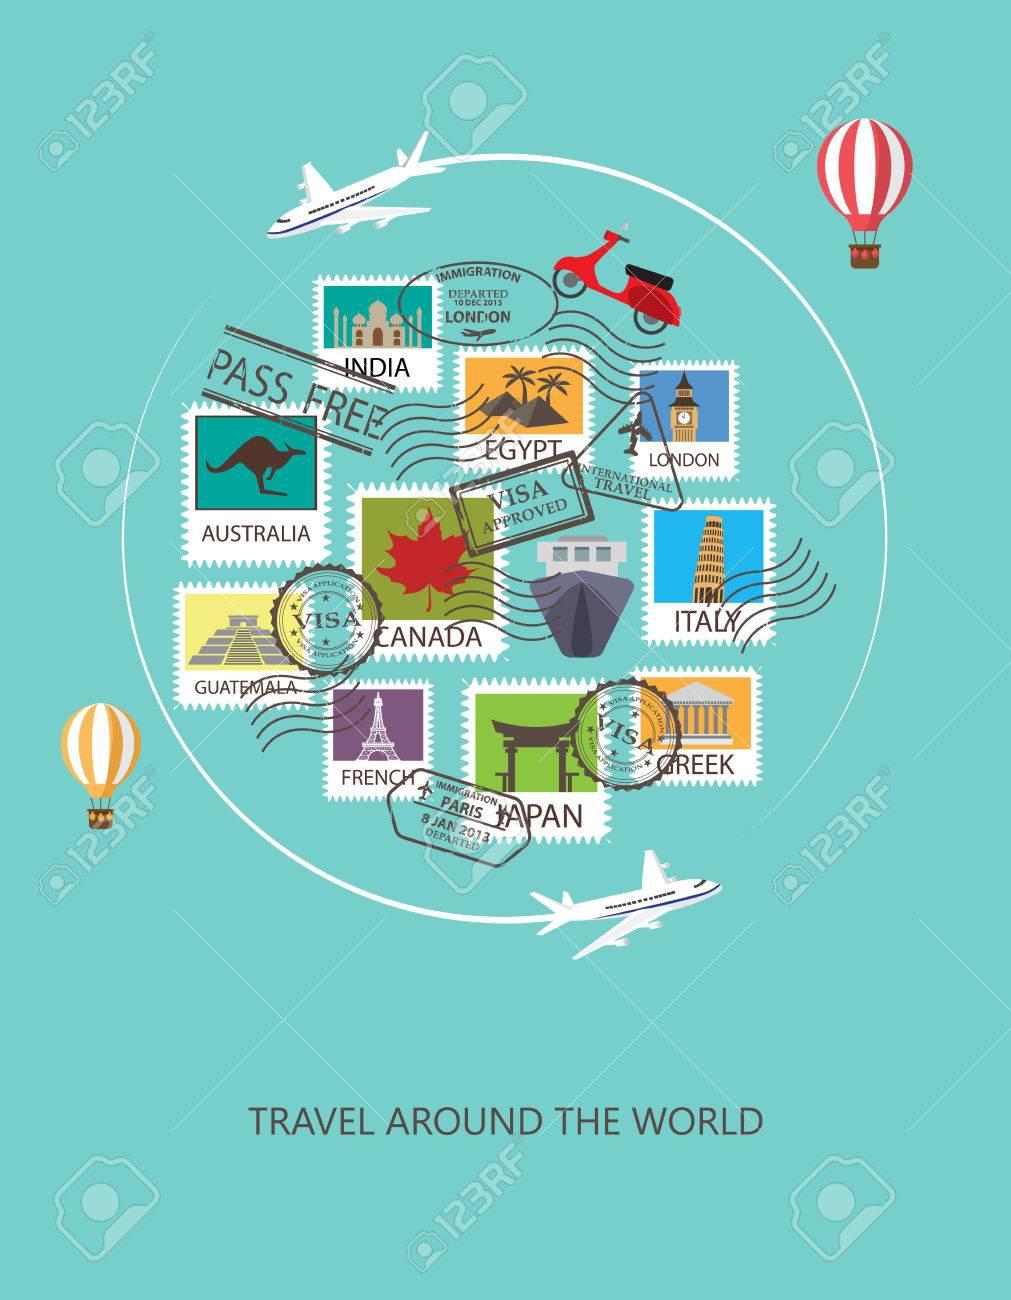 world travel background. - 53611269